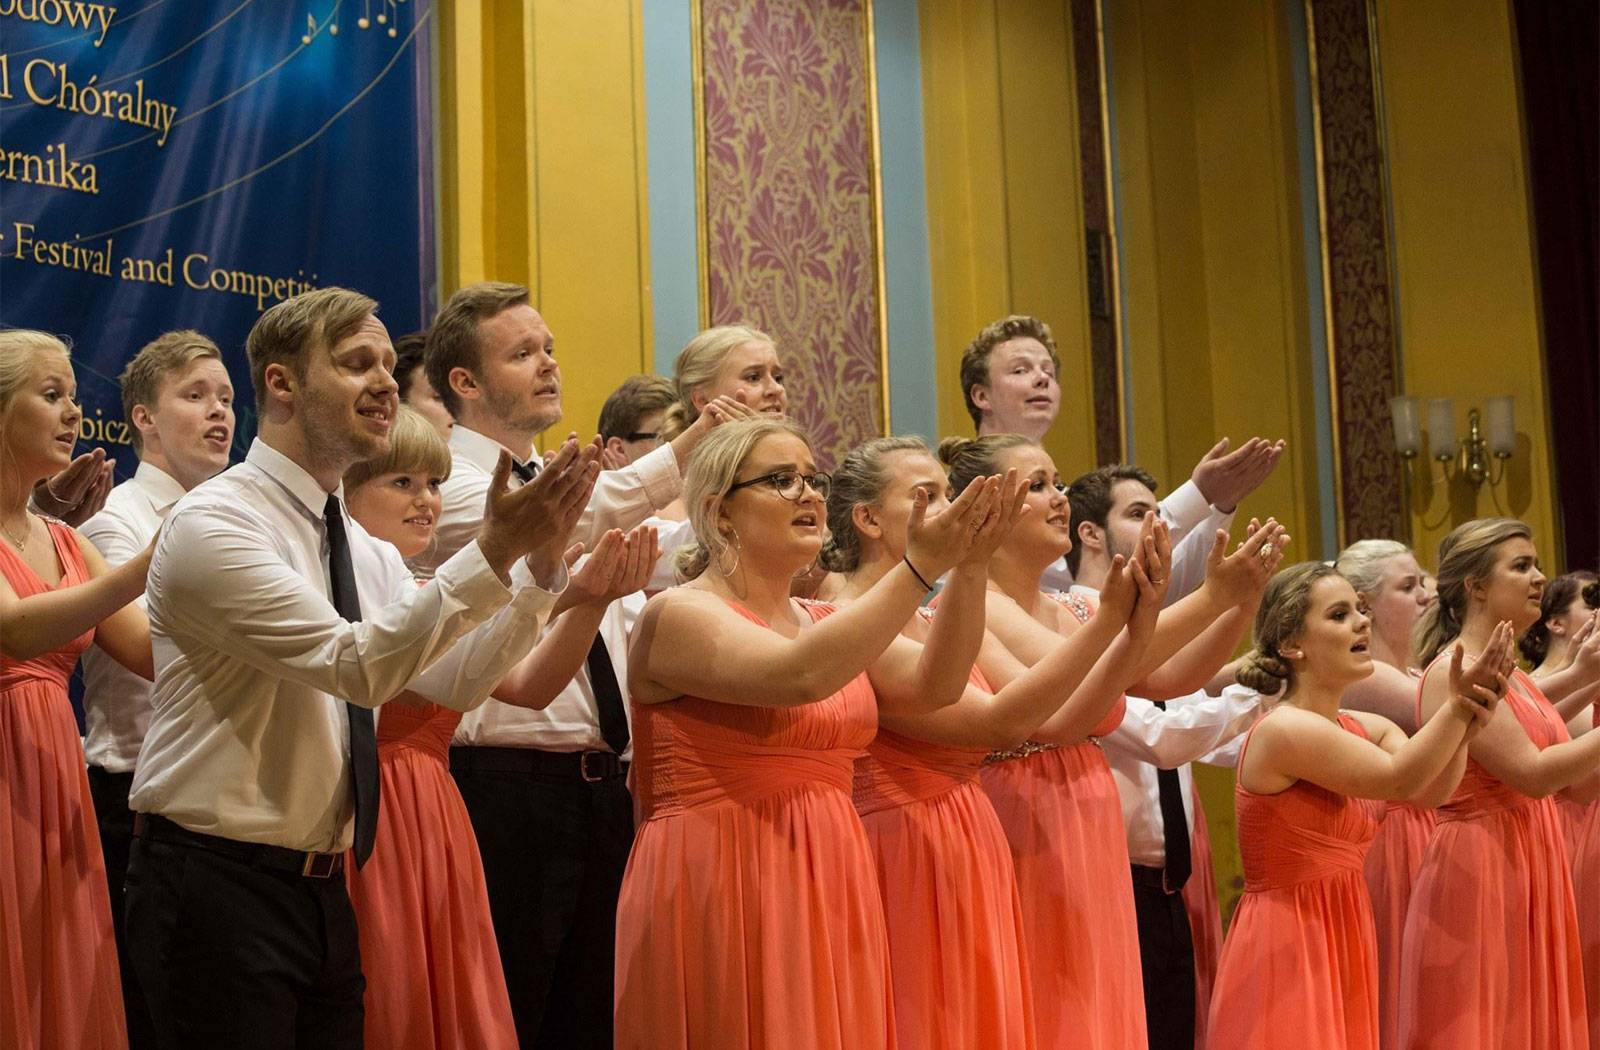 Pipekonsert - Defrost Youth Choir